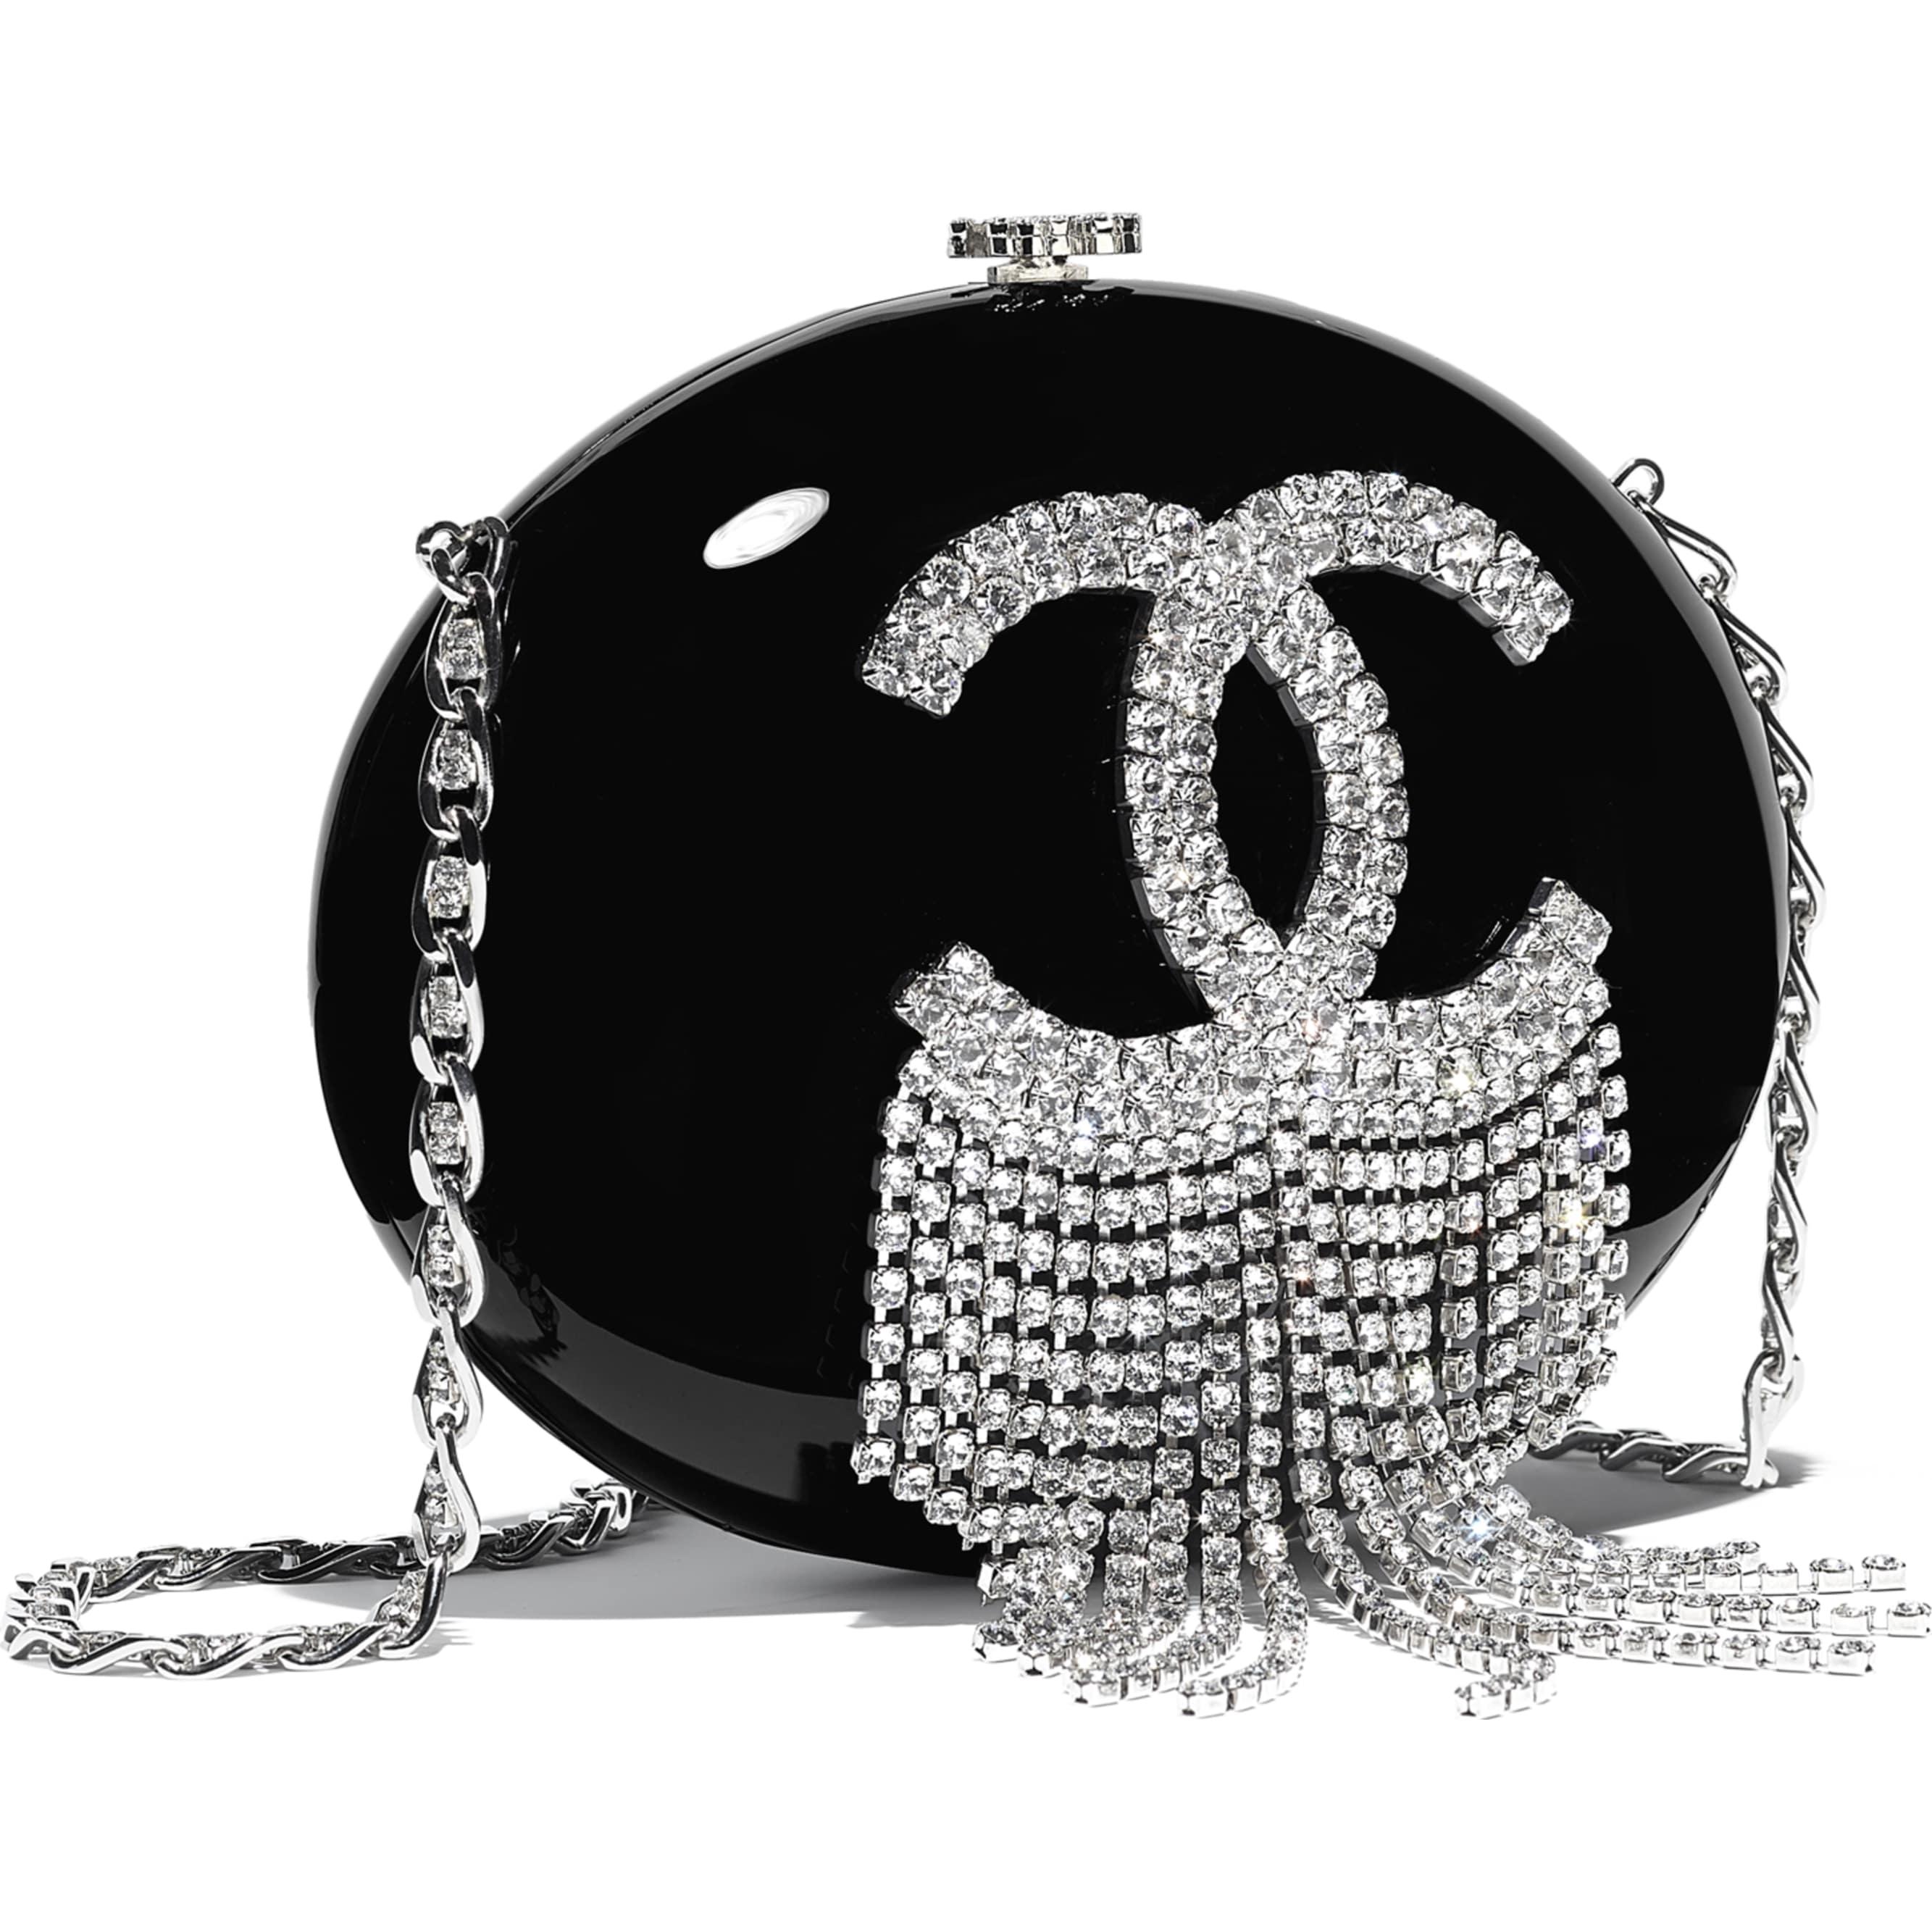 Chanel Minaudiere Resin/Strass Black